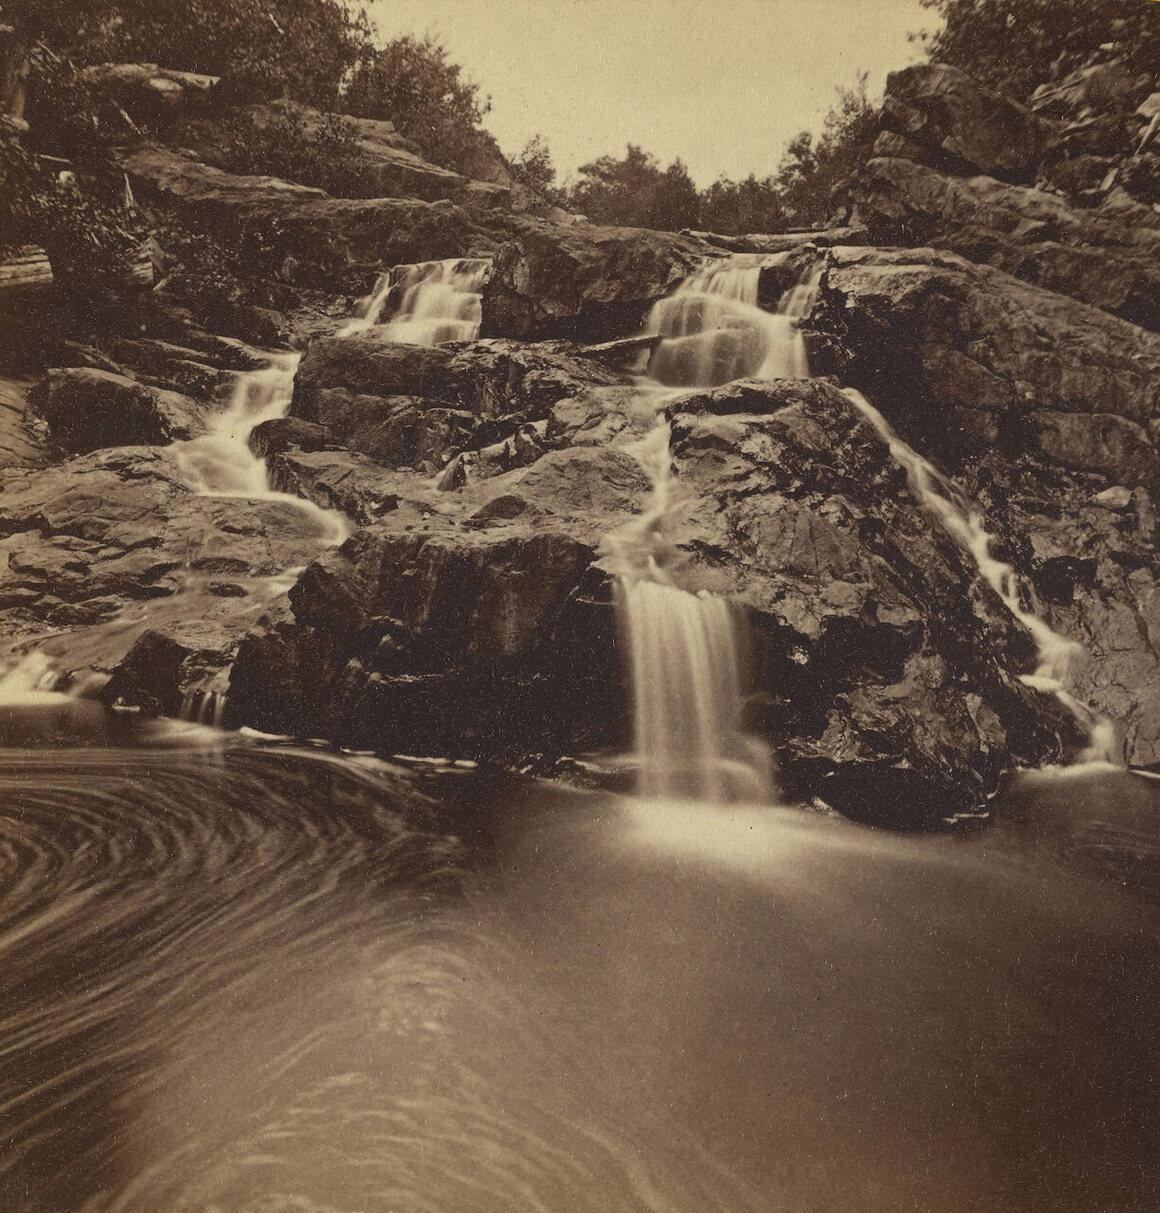 Duck Brook, Mt. Desert, in what is now Acadia National Park in Maine, Bryant Bradley, 1885.